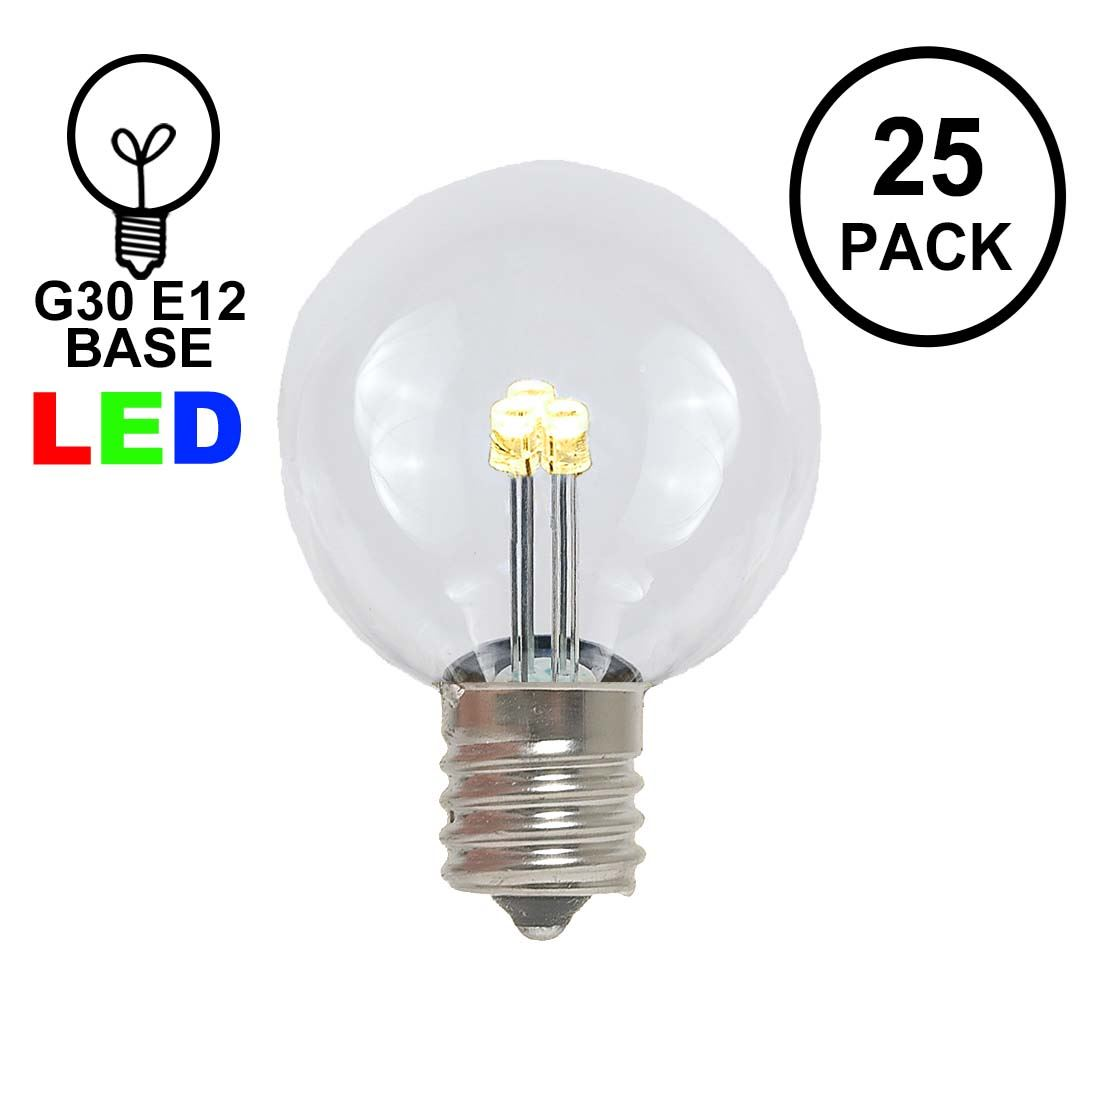 Novelty Lights 25 Pack G30 Led Outdoor String Light Patio